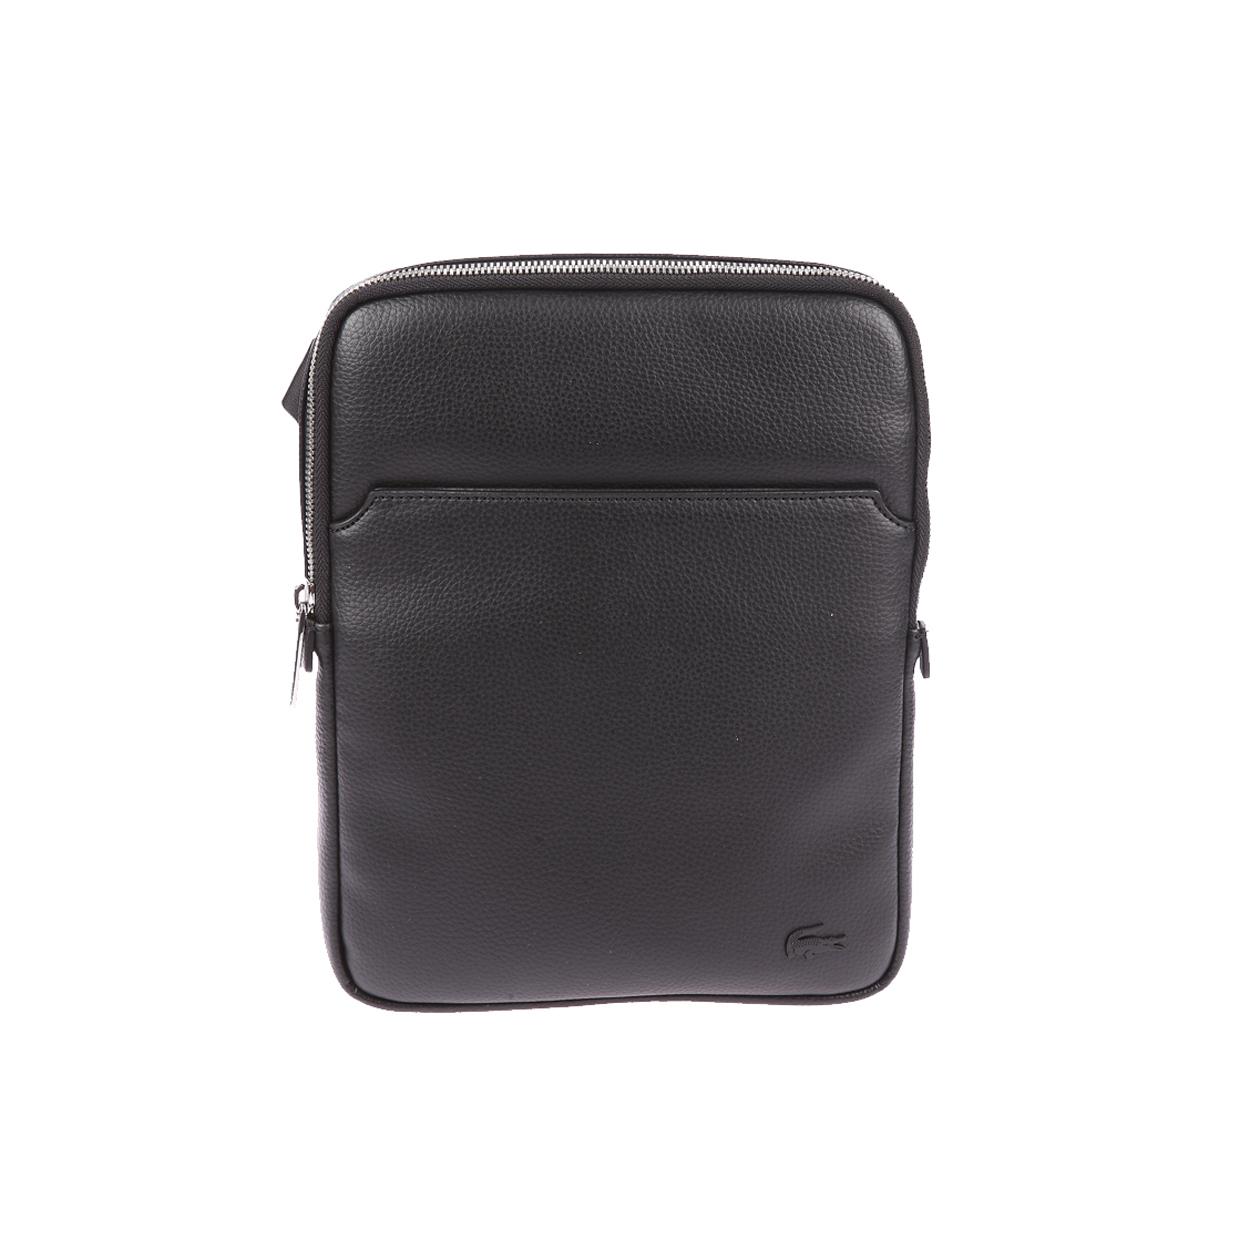 Sacoche plate  en simili cuir texturé noir